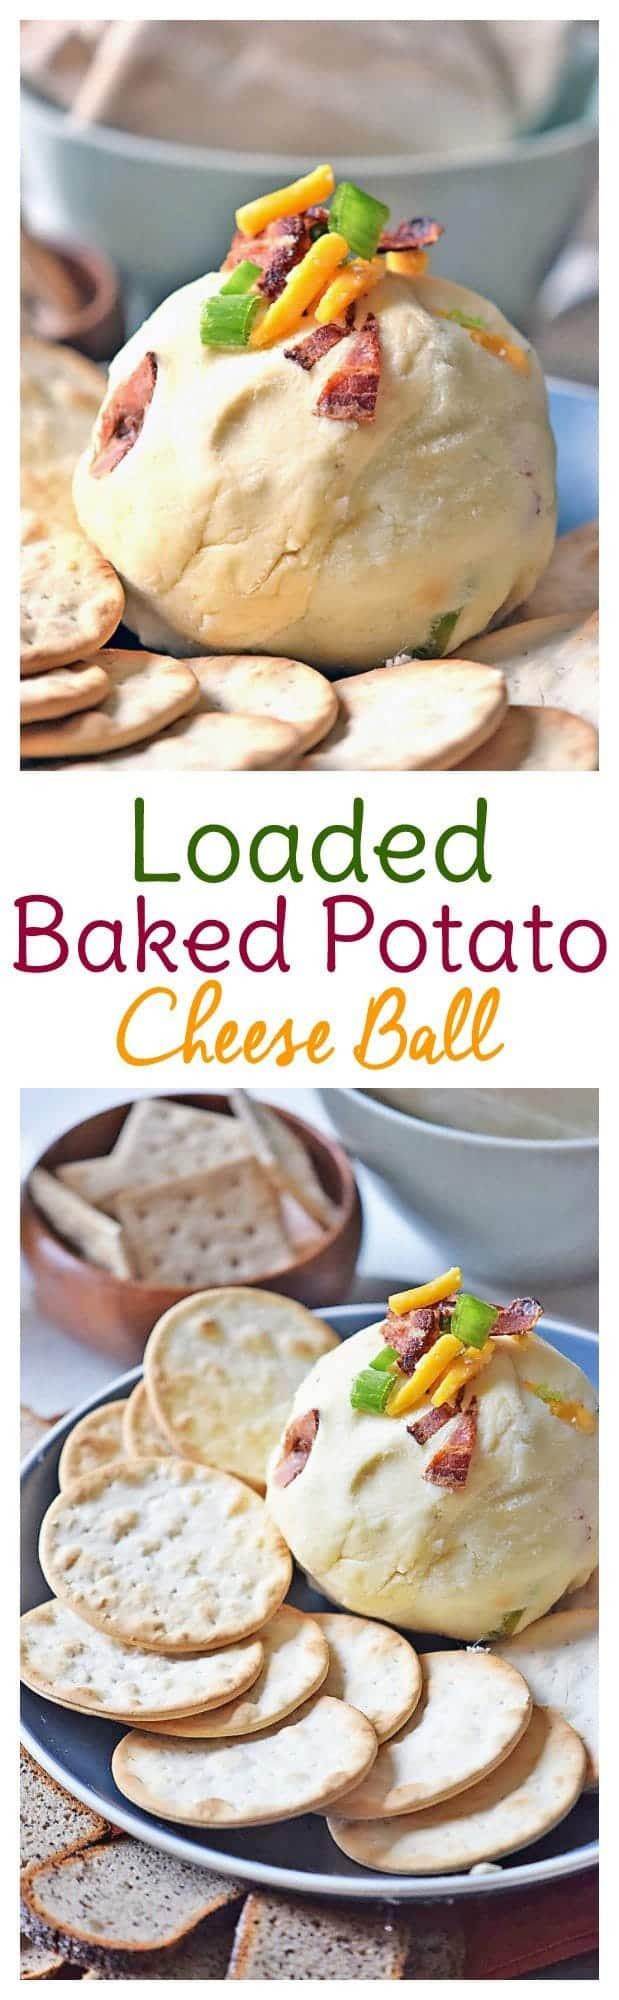 Loaded Baked Potato Cheese Ball - Sweet T Makes Three